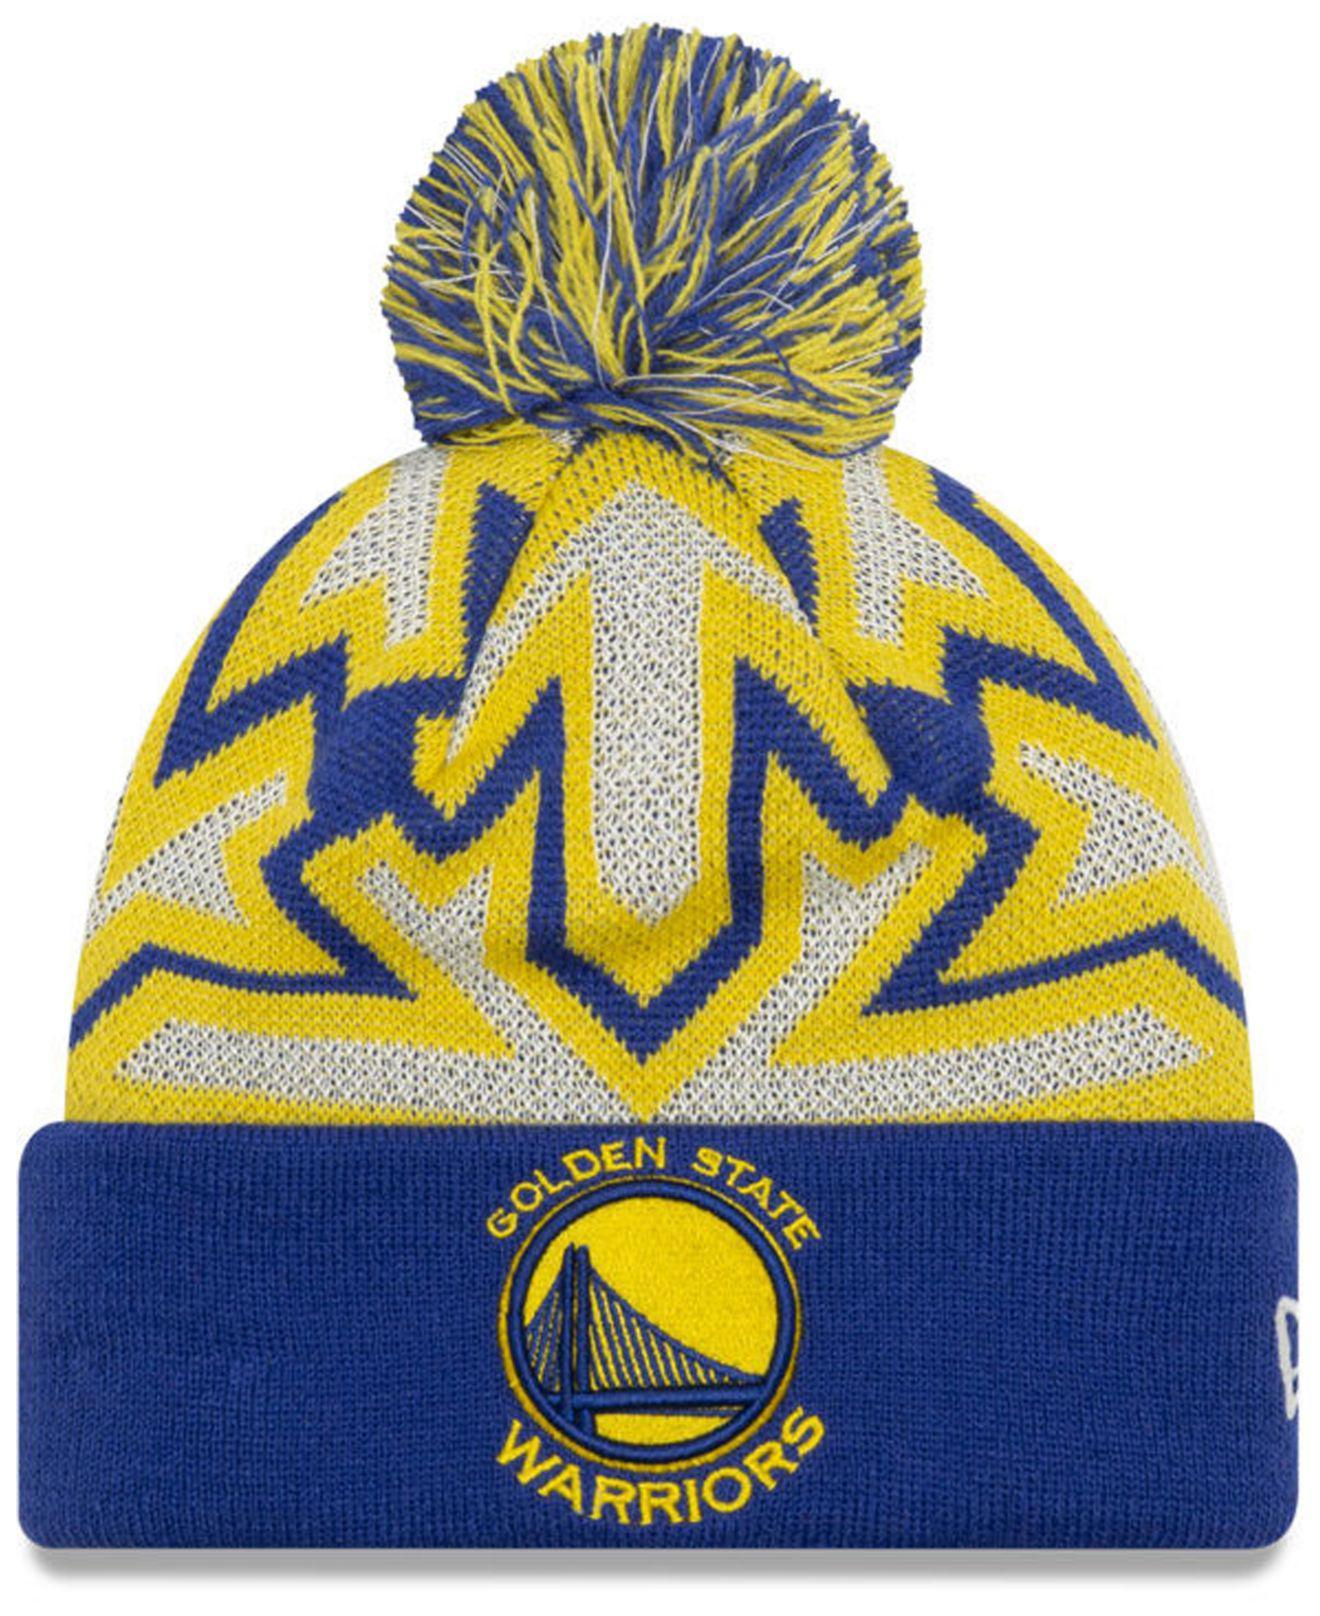 reputable site 8e1f7 8841c KTZ. Men s Yellow Golden State Warriors Glowflake Cuff Knit Hat